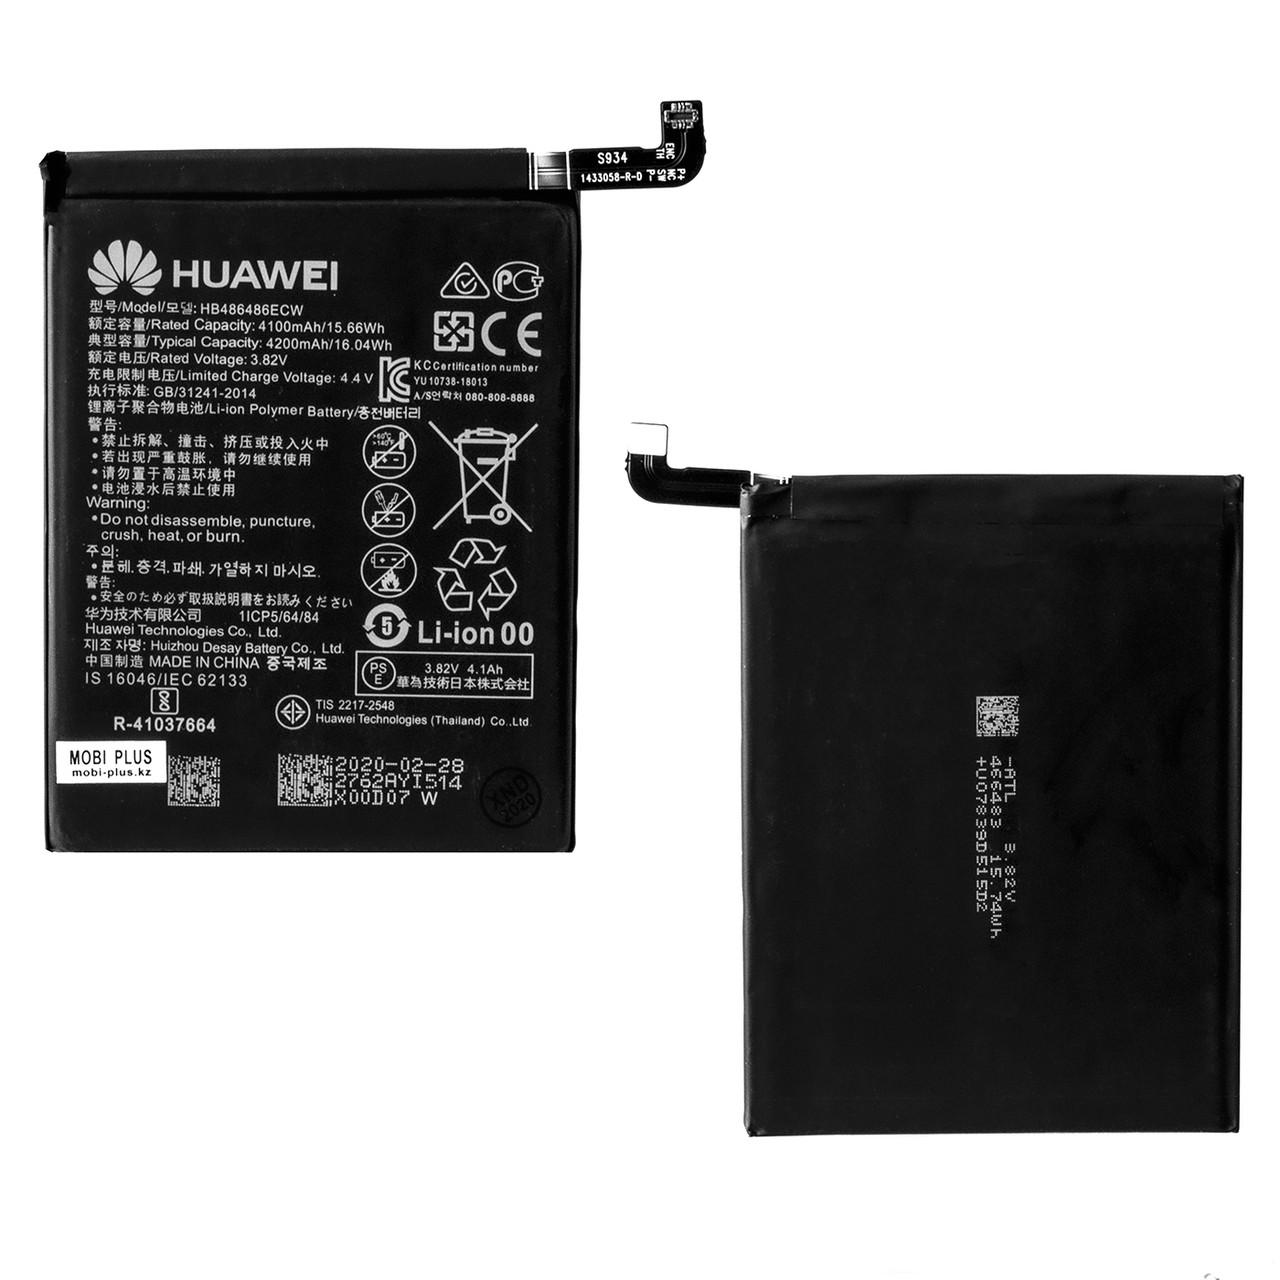 Аккумулятор Huawei HB486486ECW Mate 20 Pro/P30 Pro 4100mAh GU Electronic